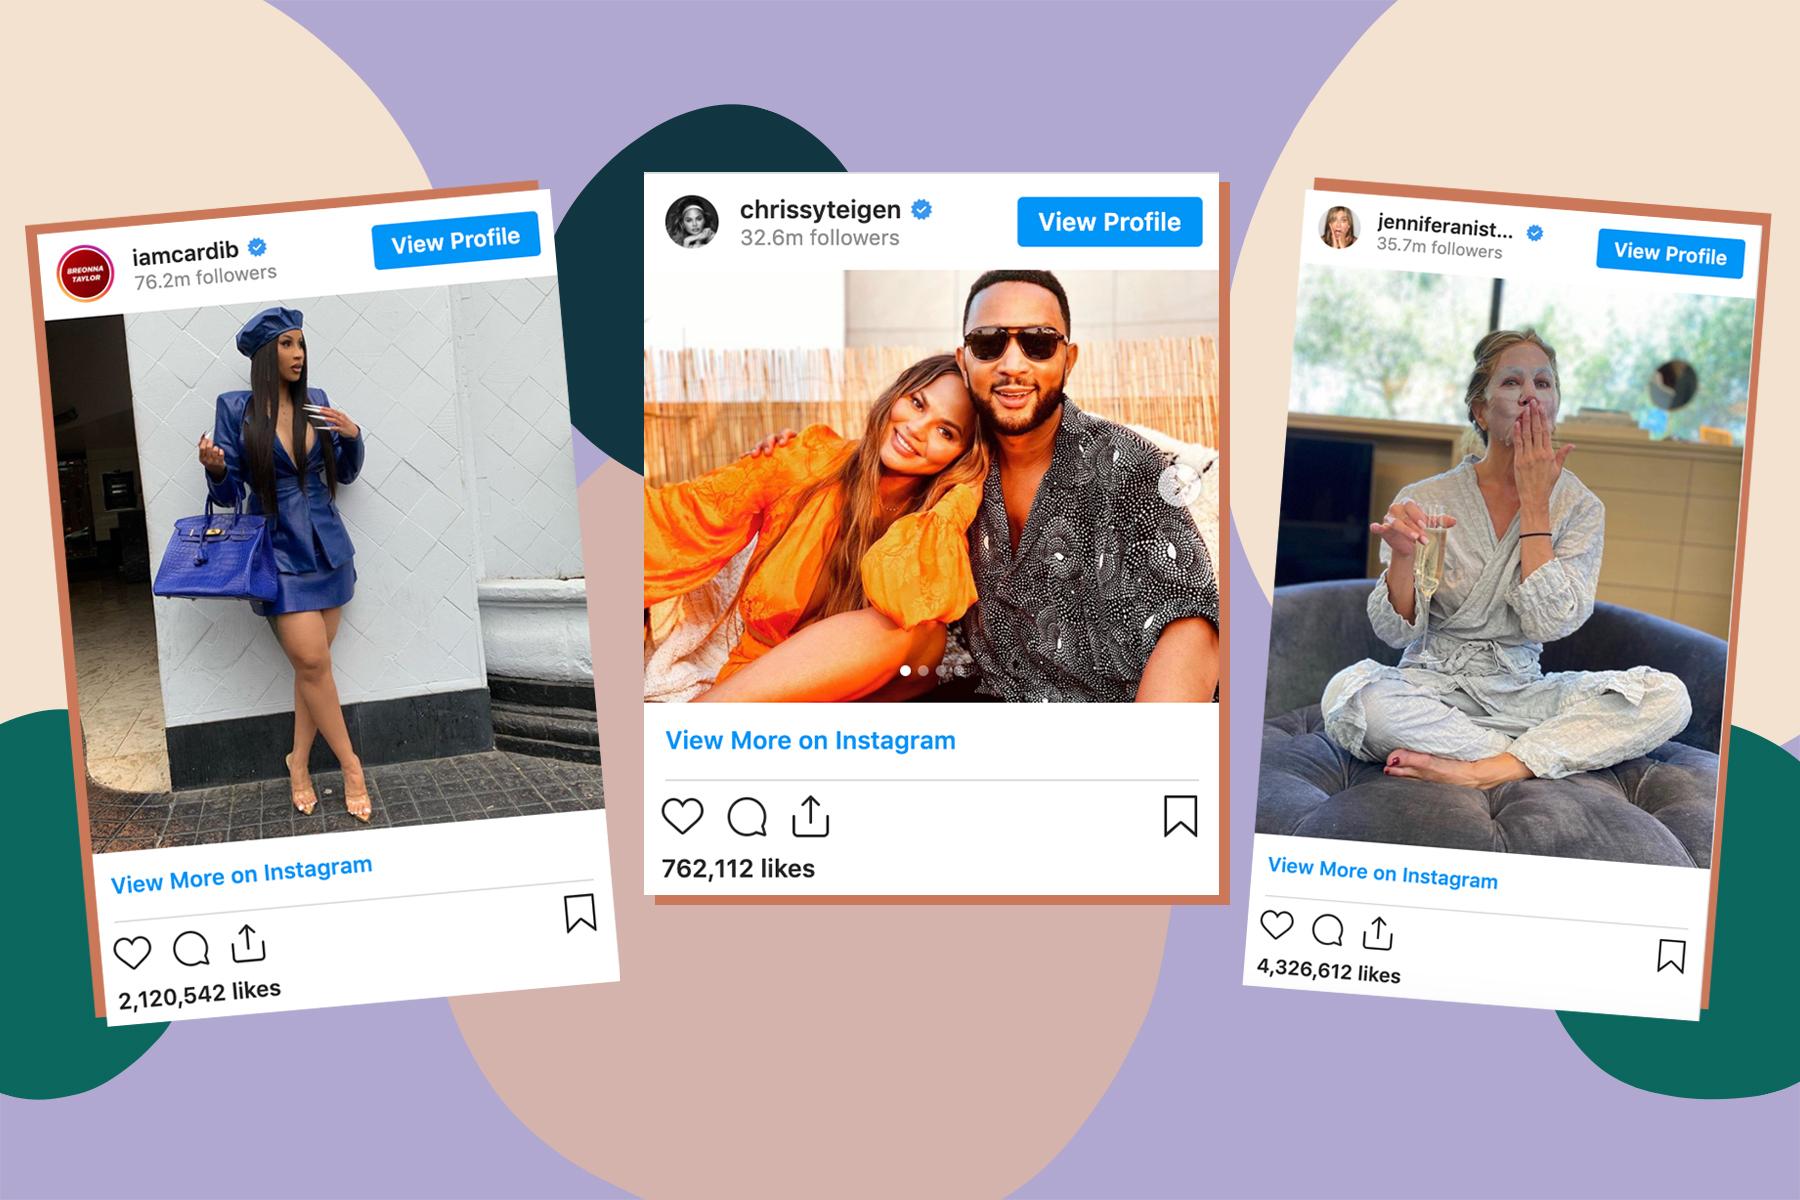 Instagram-celebrity